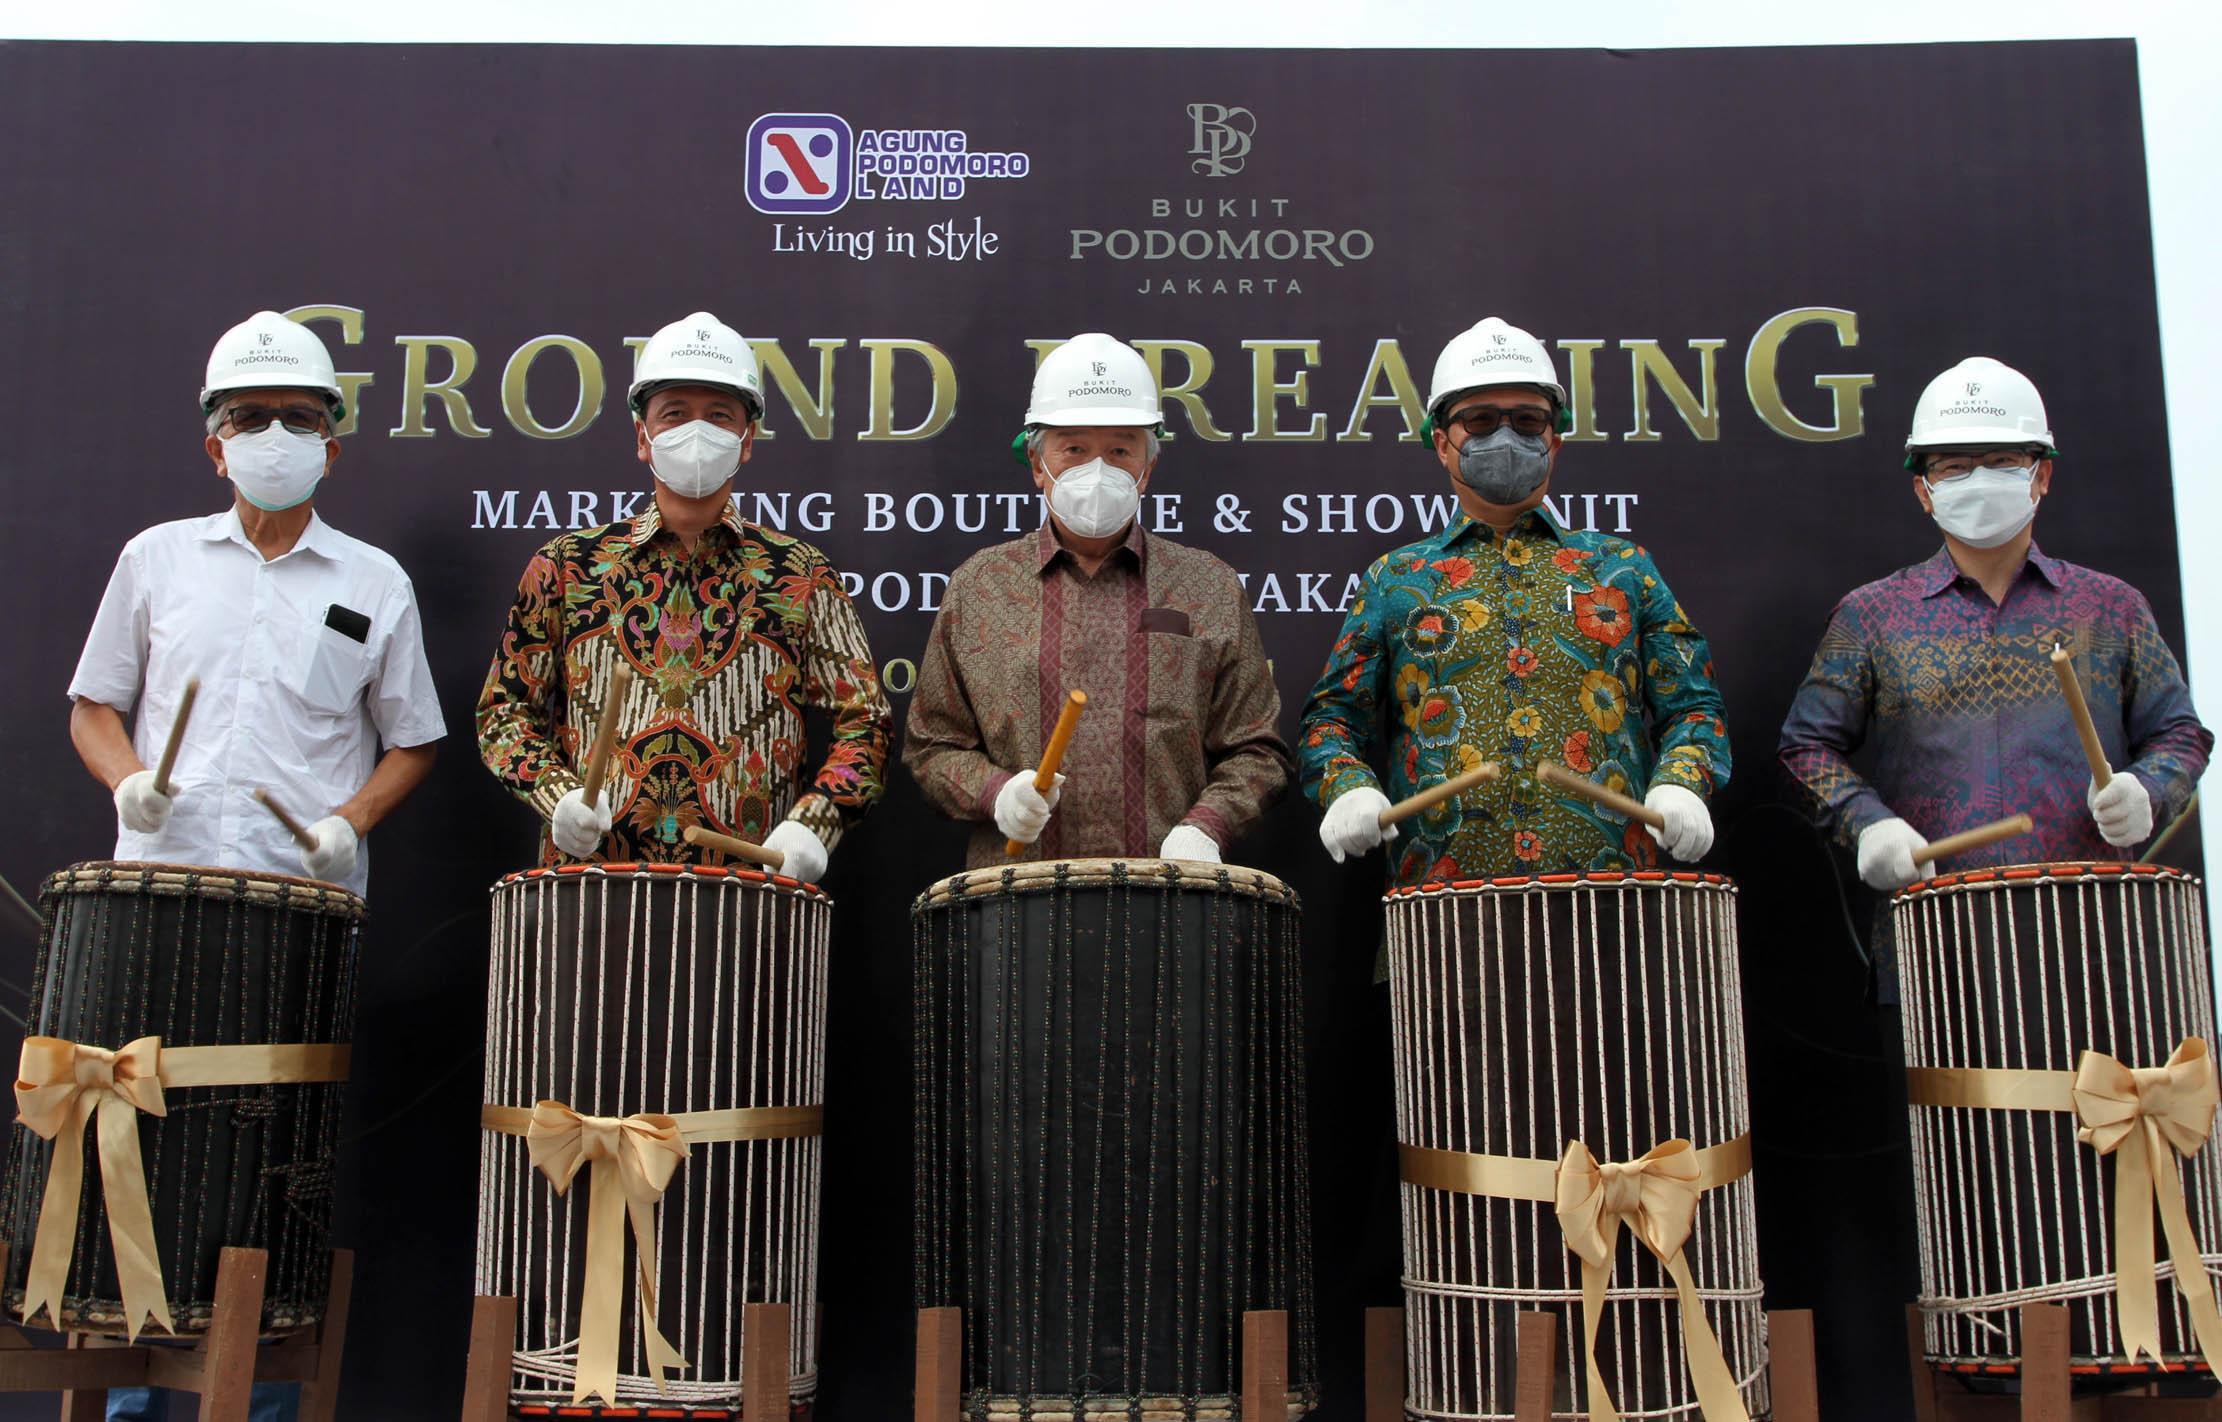 Perkuat Komitmen Bangkitkan Sektor Properti Indonesia, Agung Podomoro Land Lakukan Ground Breaking Marketing Boutique Bukit Podomoro Jakarta